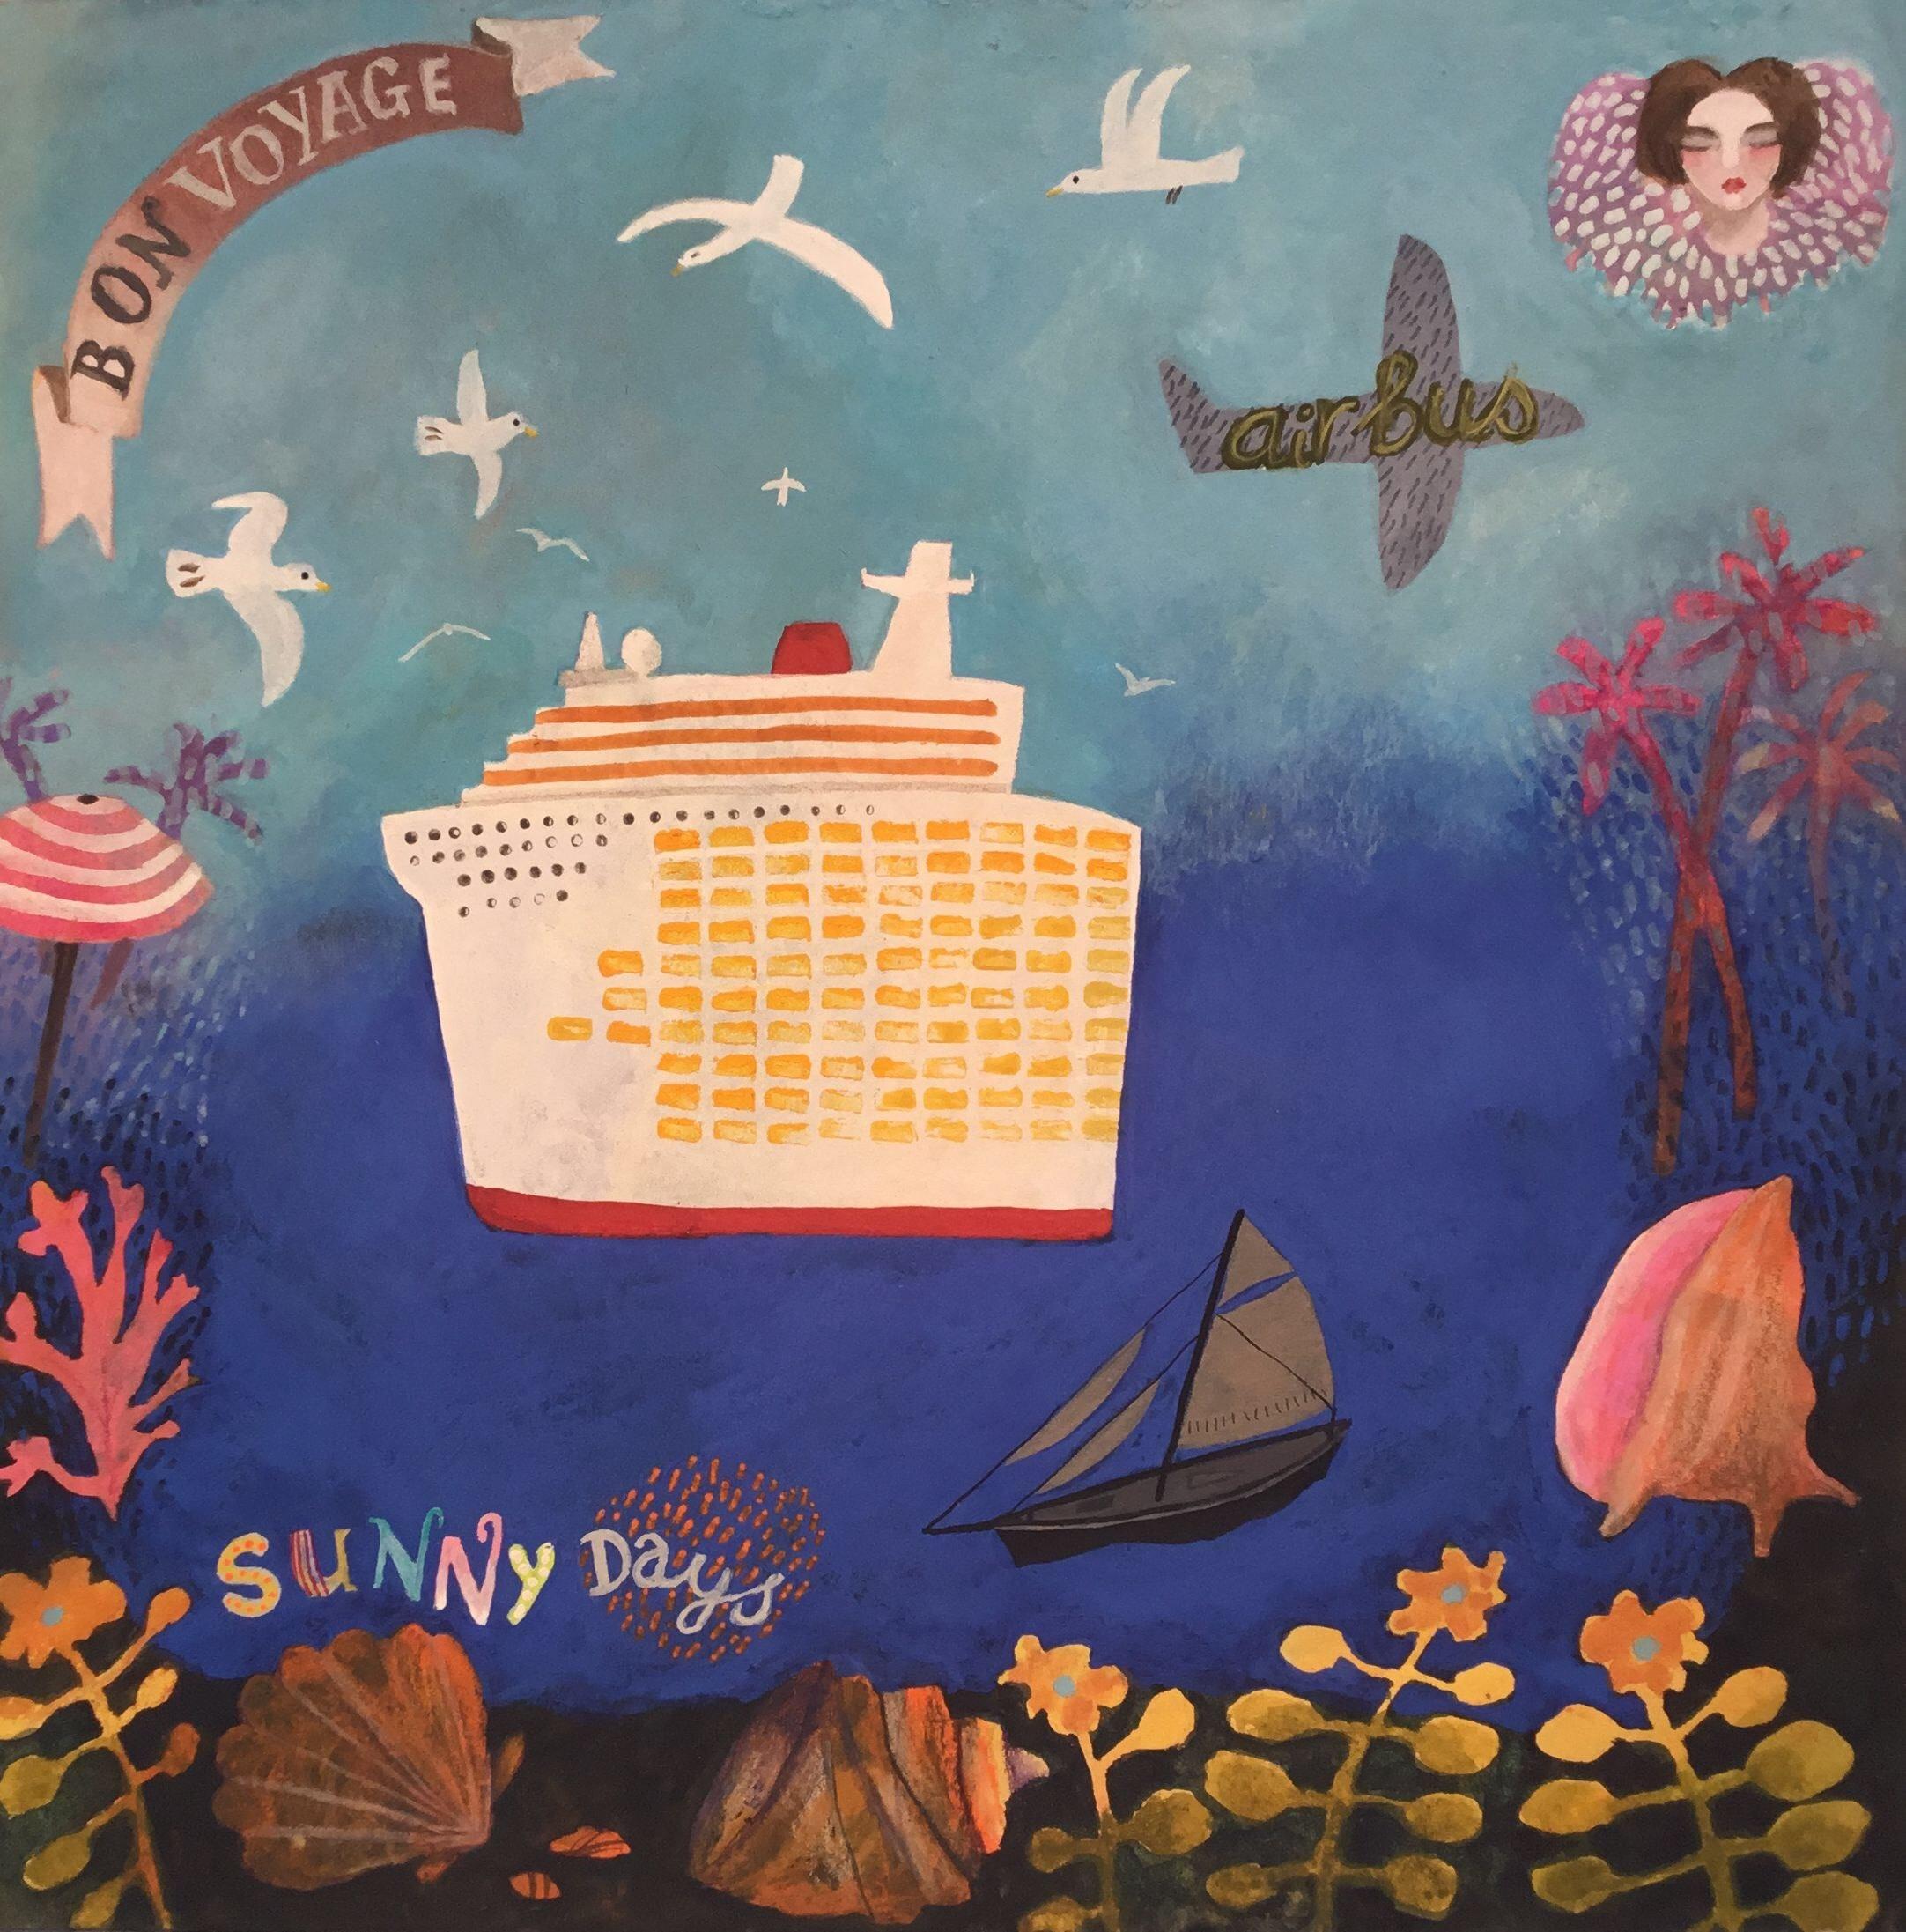 "<span class=""link fancybox-details-link""><a href=""/artists/146-gertie-young/works/11873-gertie-young-bon-voyage/"">View Detail Page</a></span><div class=""artist""><span class=""artist""><strong>Gertie Young</strong></span></div><div class=""title""><em>Bon Voyage</em></div><div class=""medium"">watercolour & gouache collage</div><div class=""dimensions"">Frame: 32 x 26 cm<br /> Artwork: 21 x 15 cm<br /> </div><div class=""price"">£370.00</div>"